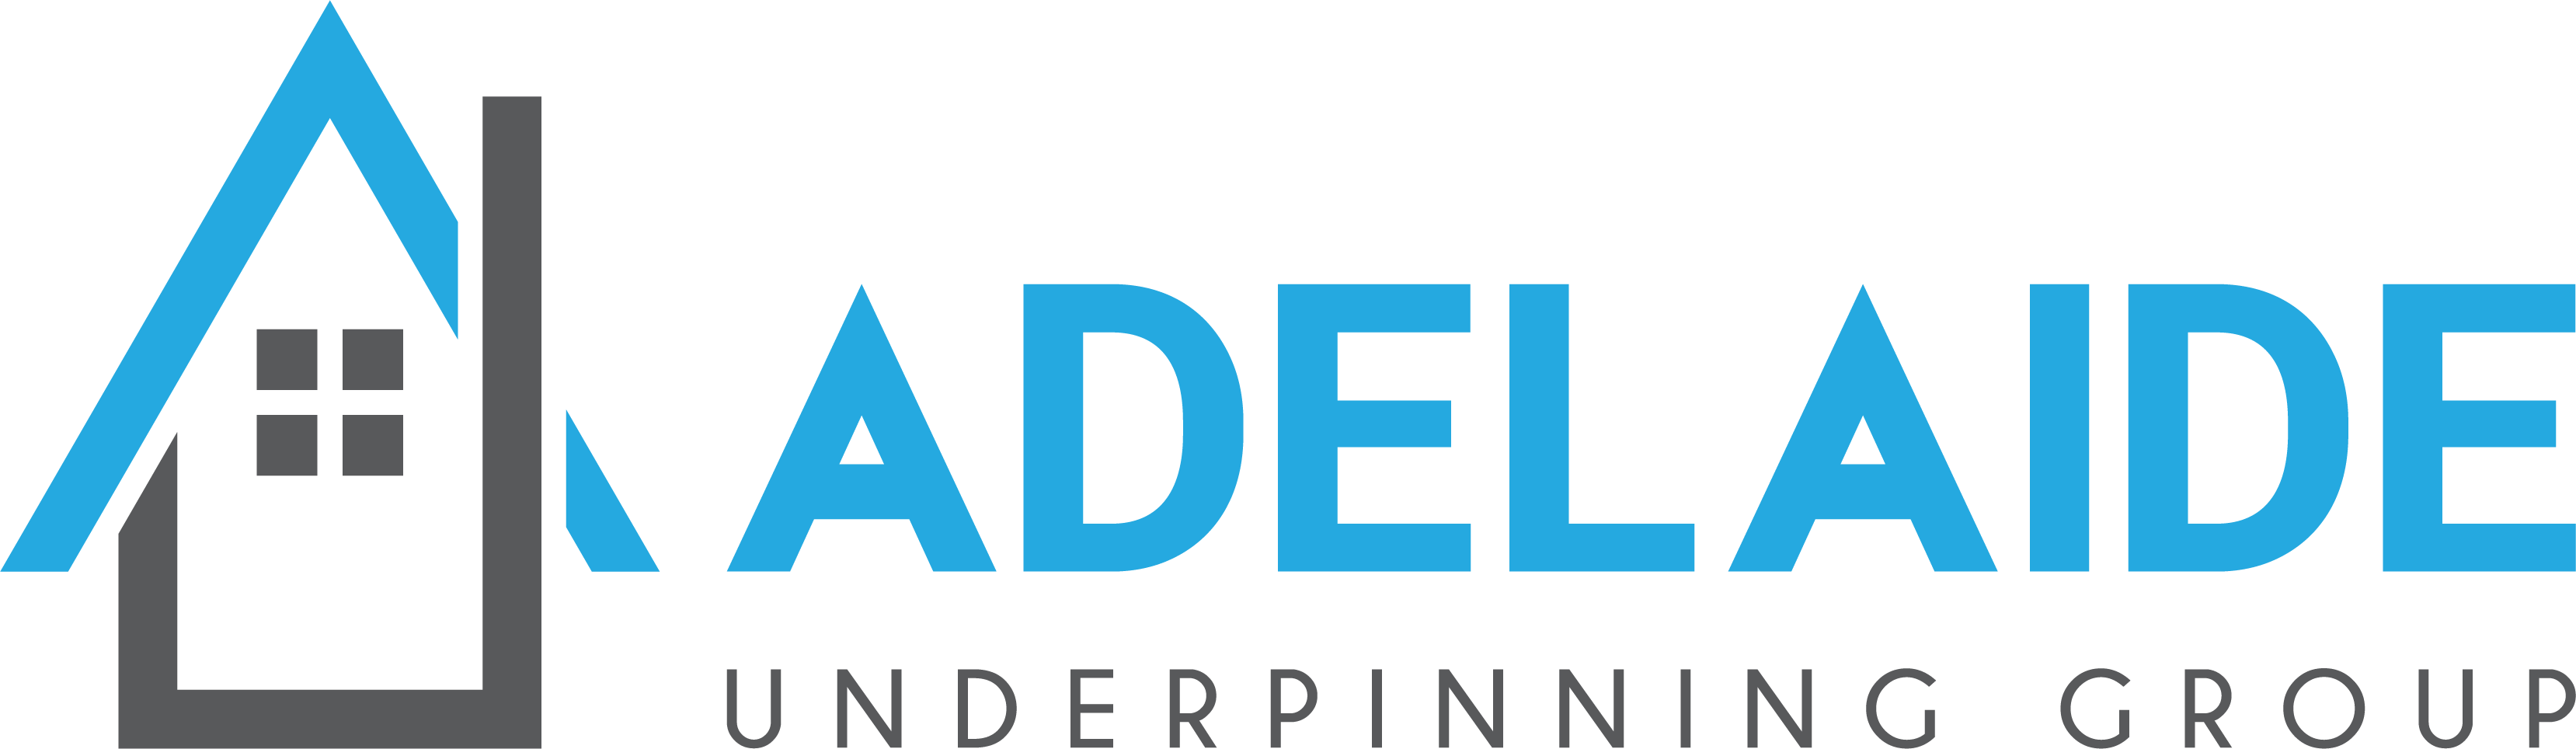 Adelaide Underpinning